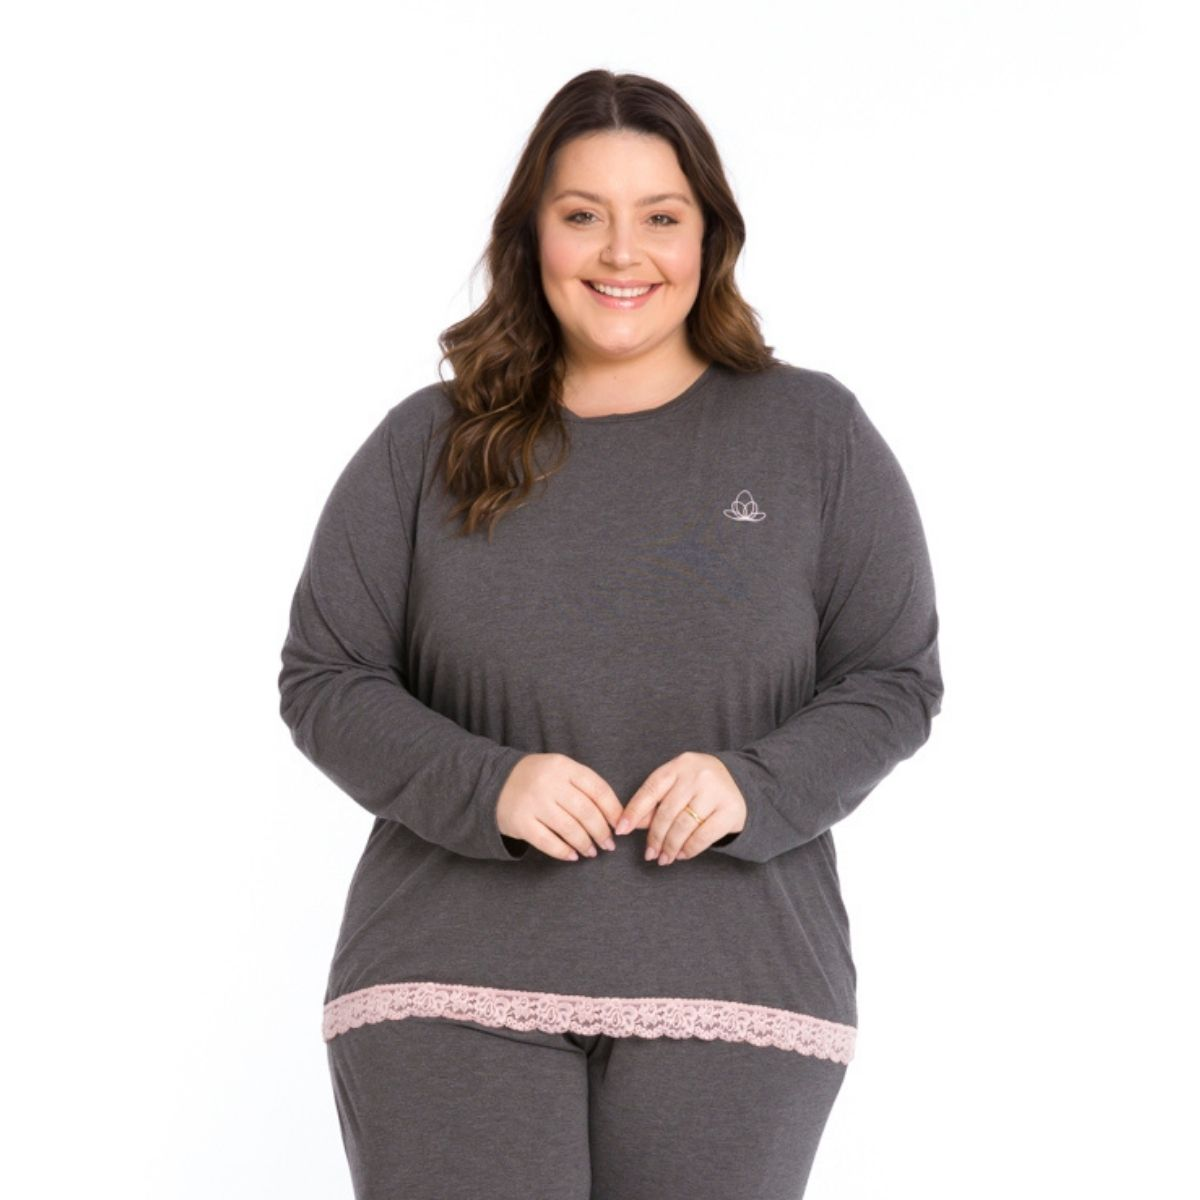 Pijama adulto feminino algodão chumbo plus size